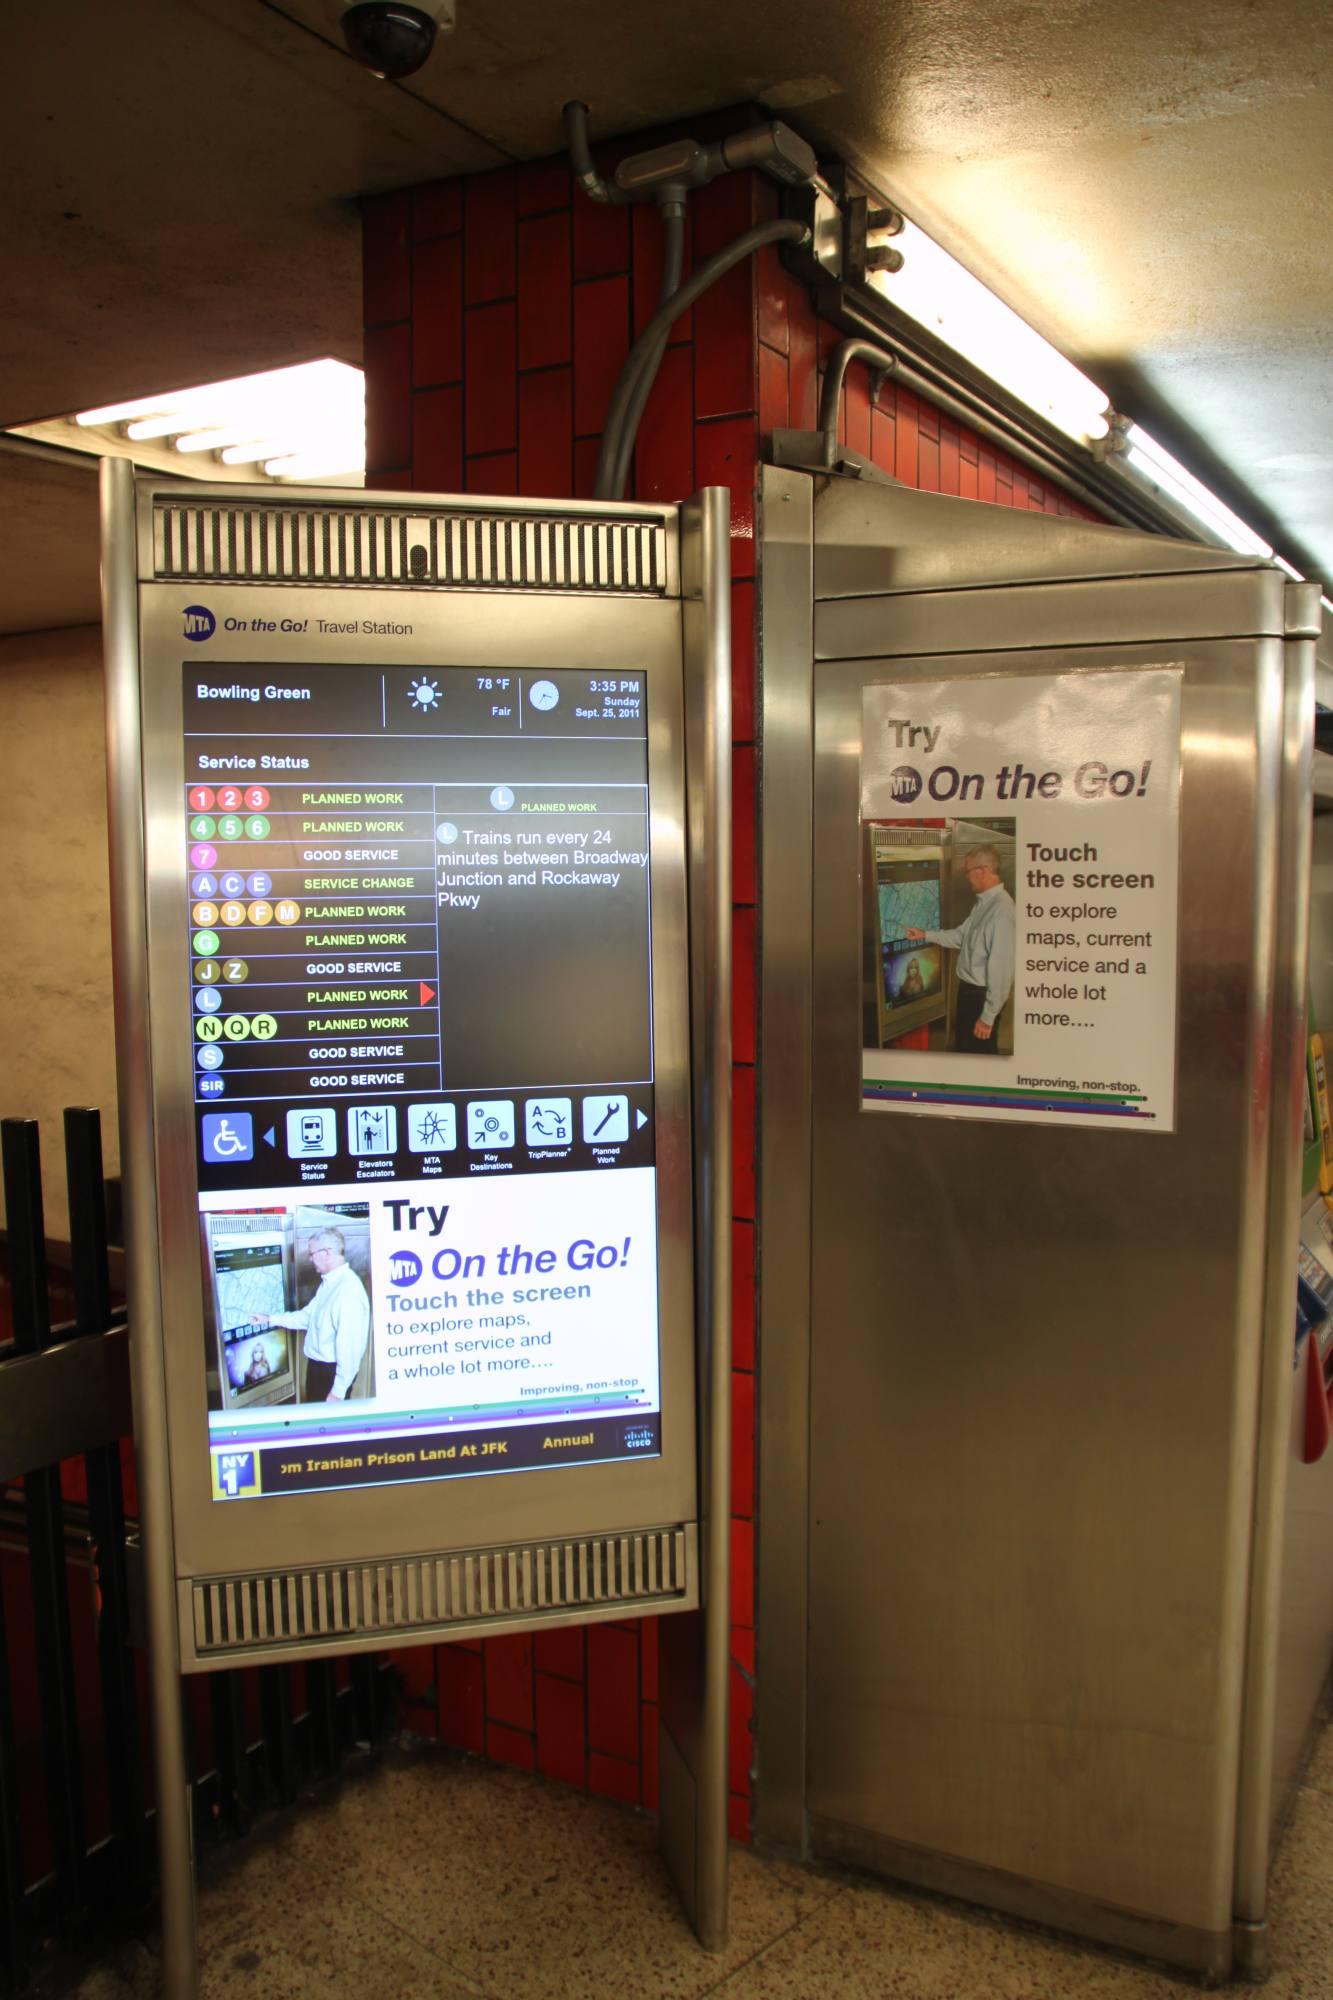 (243k, 1333x2000)<br><b>Country:</b> United States<br><b>City:</b> New York<br><b>System:</b> New York City Transit<br><b>Line:</b> IRT East Side Line<br><b>Location:</b> Bowling Green <br><b>Photo by:</b> Robbie Rosenfeld<br><b>Date:</b> 9/25/2011<br><b>Notes:</b> New On the Go kiosk.<br><b>Viewed (this week/total):</b> 1 / 947